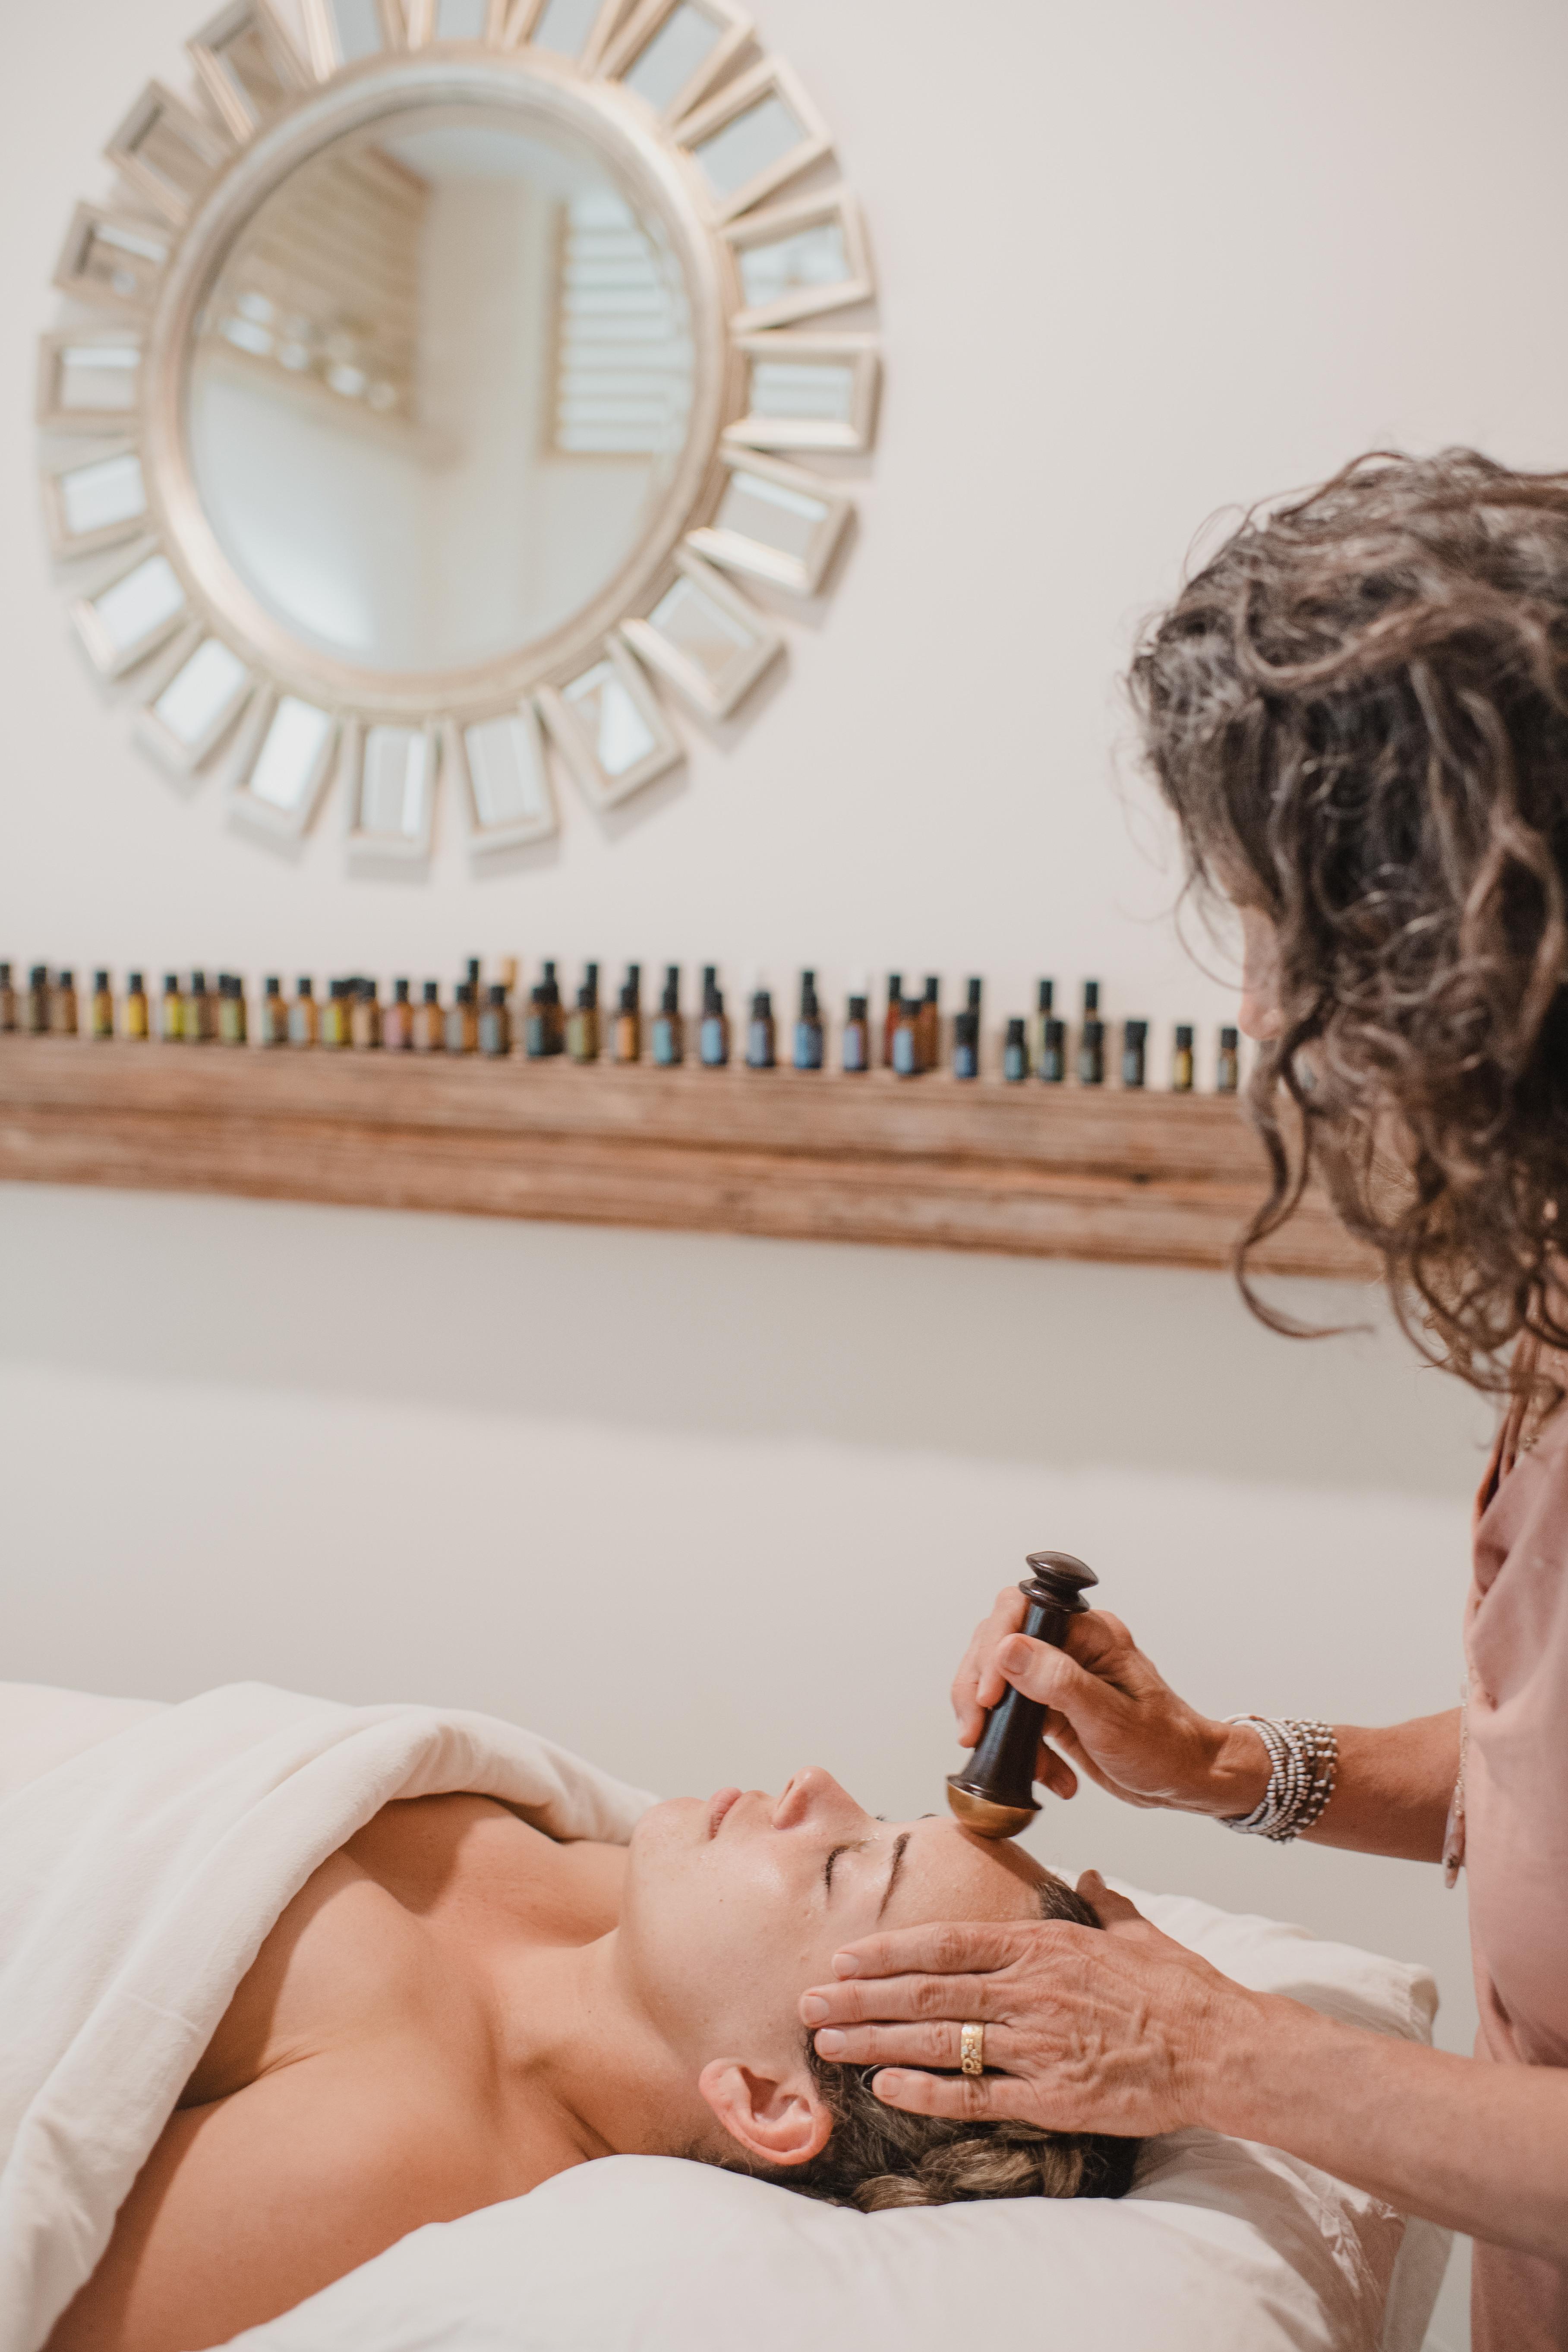 Alquimia Beauty Ritual Facial